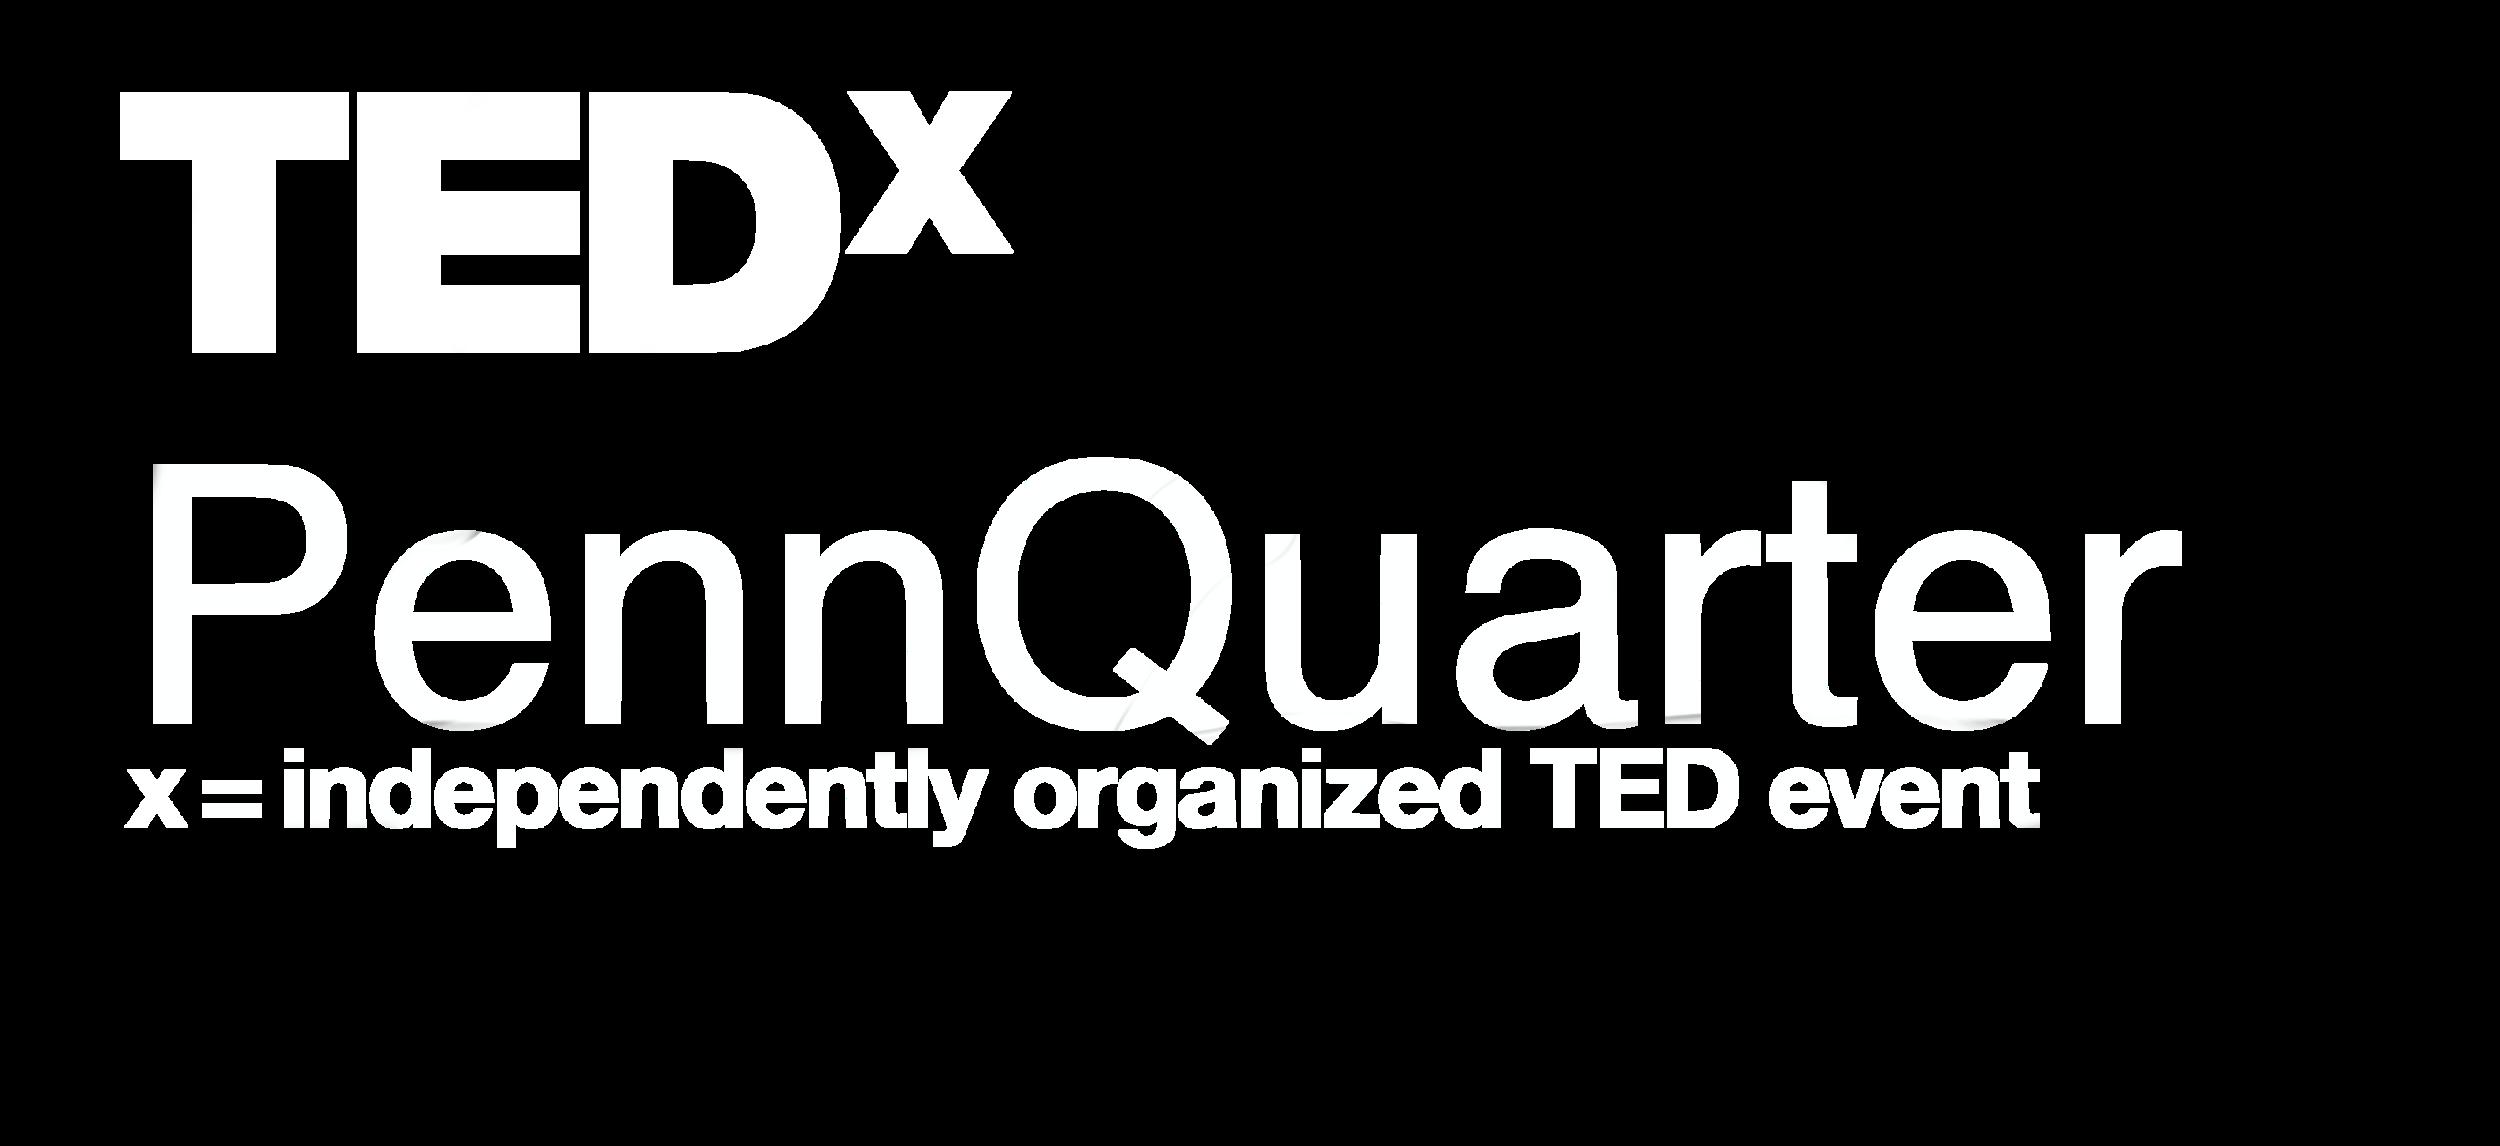 TEDx_logo_penn quarter_RGB_CS2 copy.png